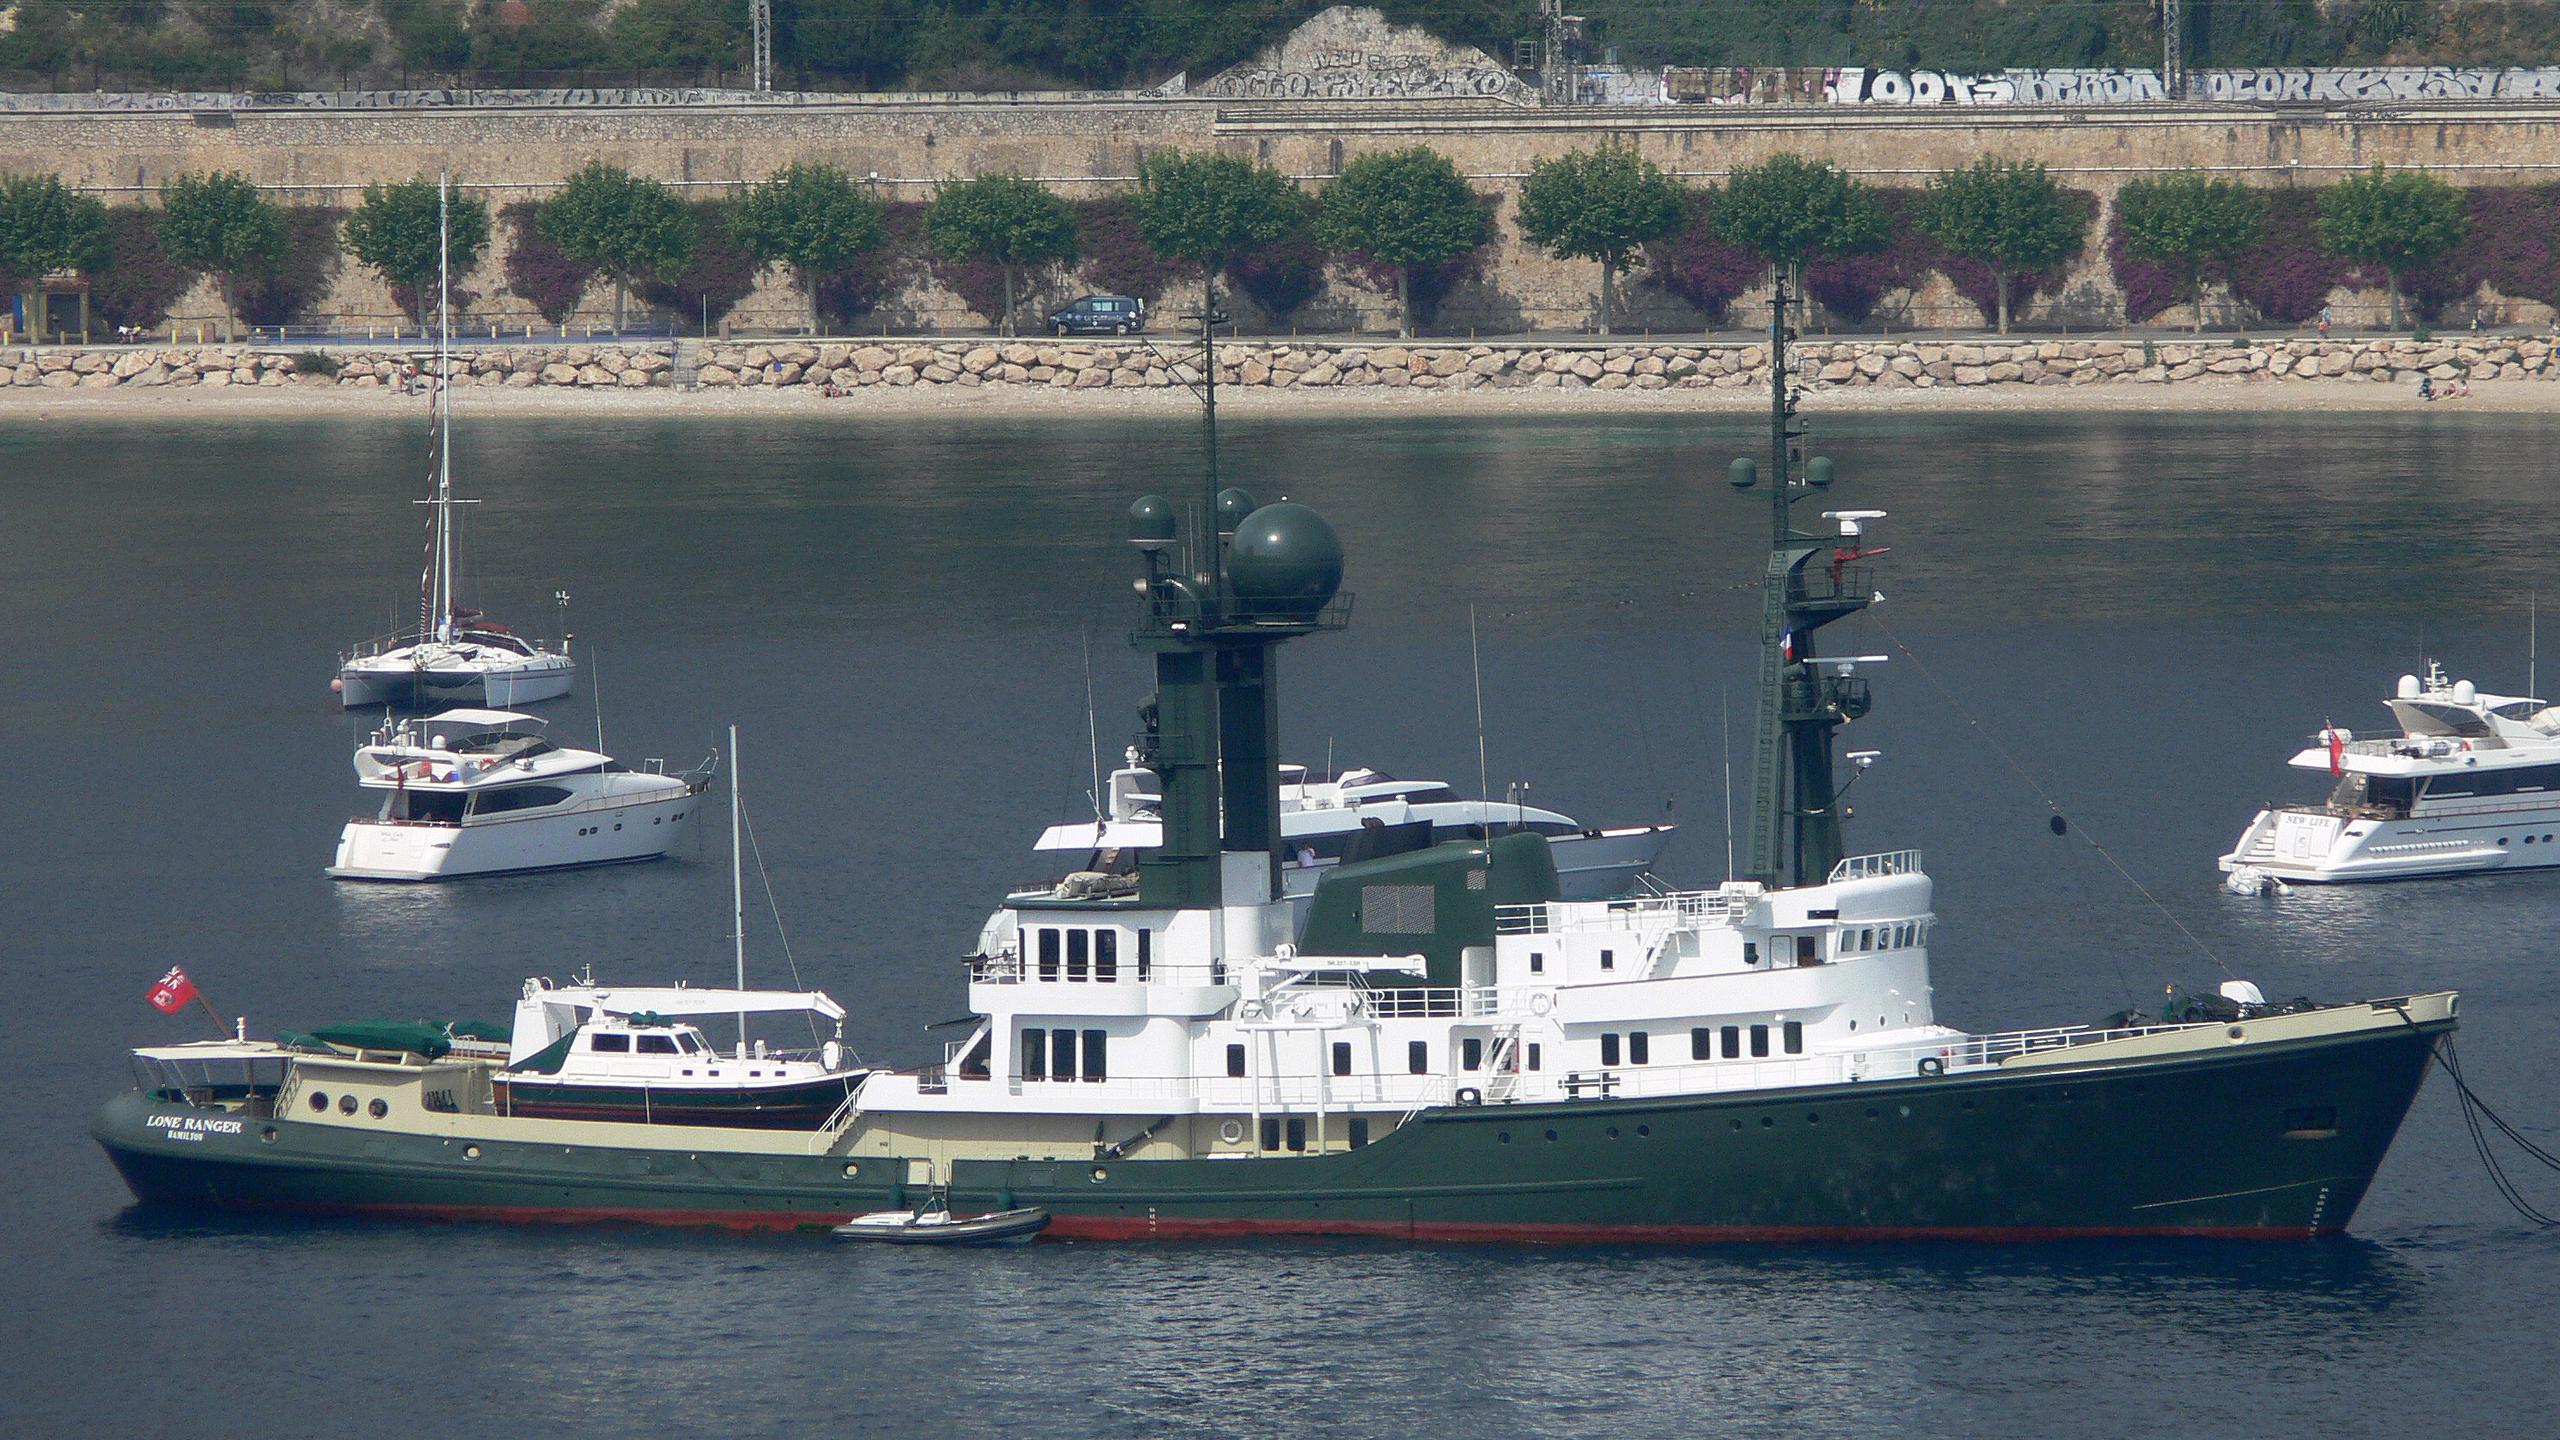 sea-ranger-classic-expedition-yacht-Schichau-Unterweser-1973-77m-profile